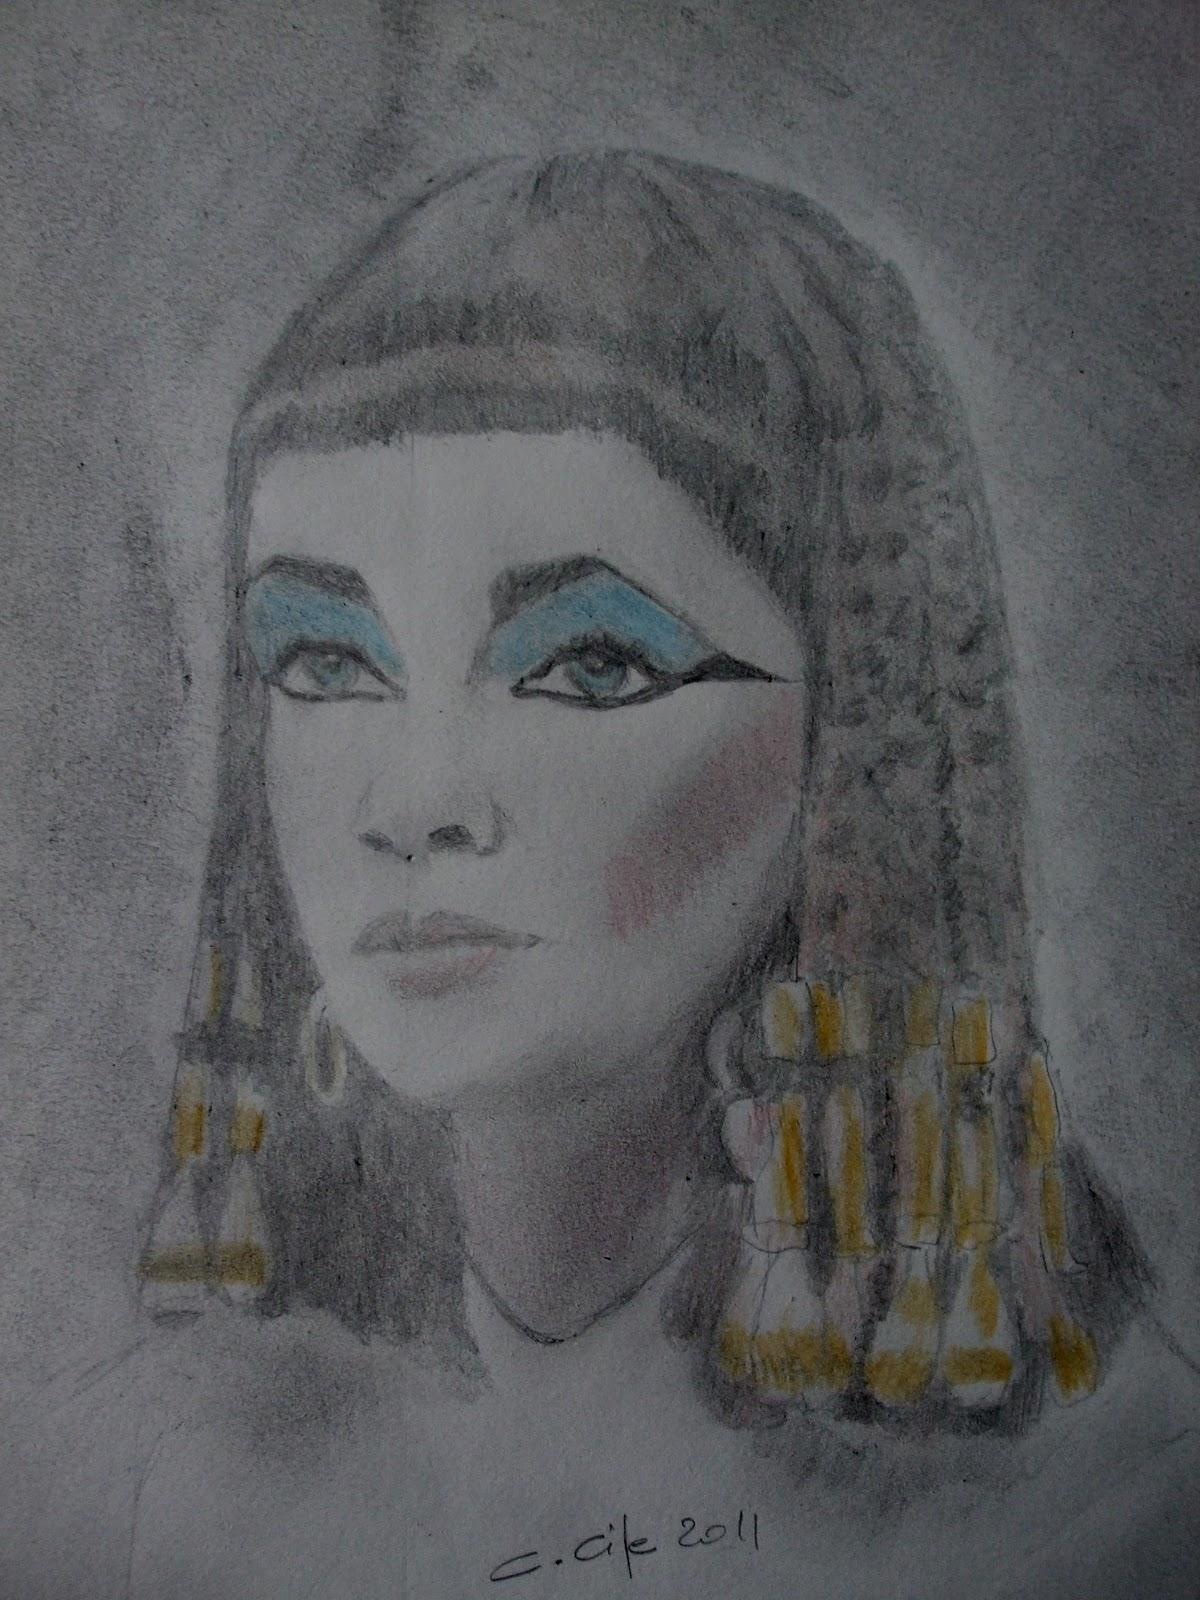 http://1.bp.blogspot.com/-BL2DetsdA5c/Tq7JocjCRuI/AAAAAAAAAjo/jCaULCs55SQ/s1600/portrait+cl%25C3%25A9opatre.jpg